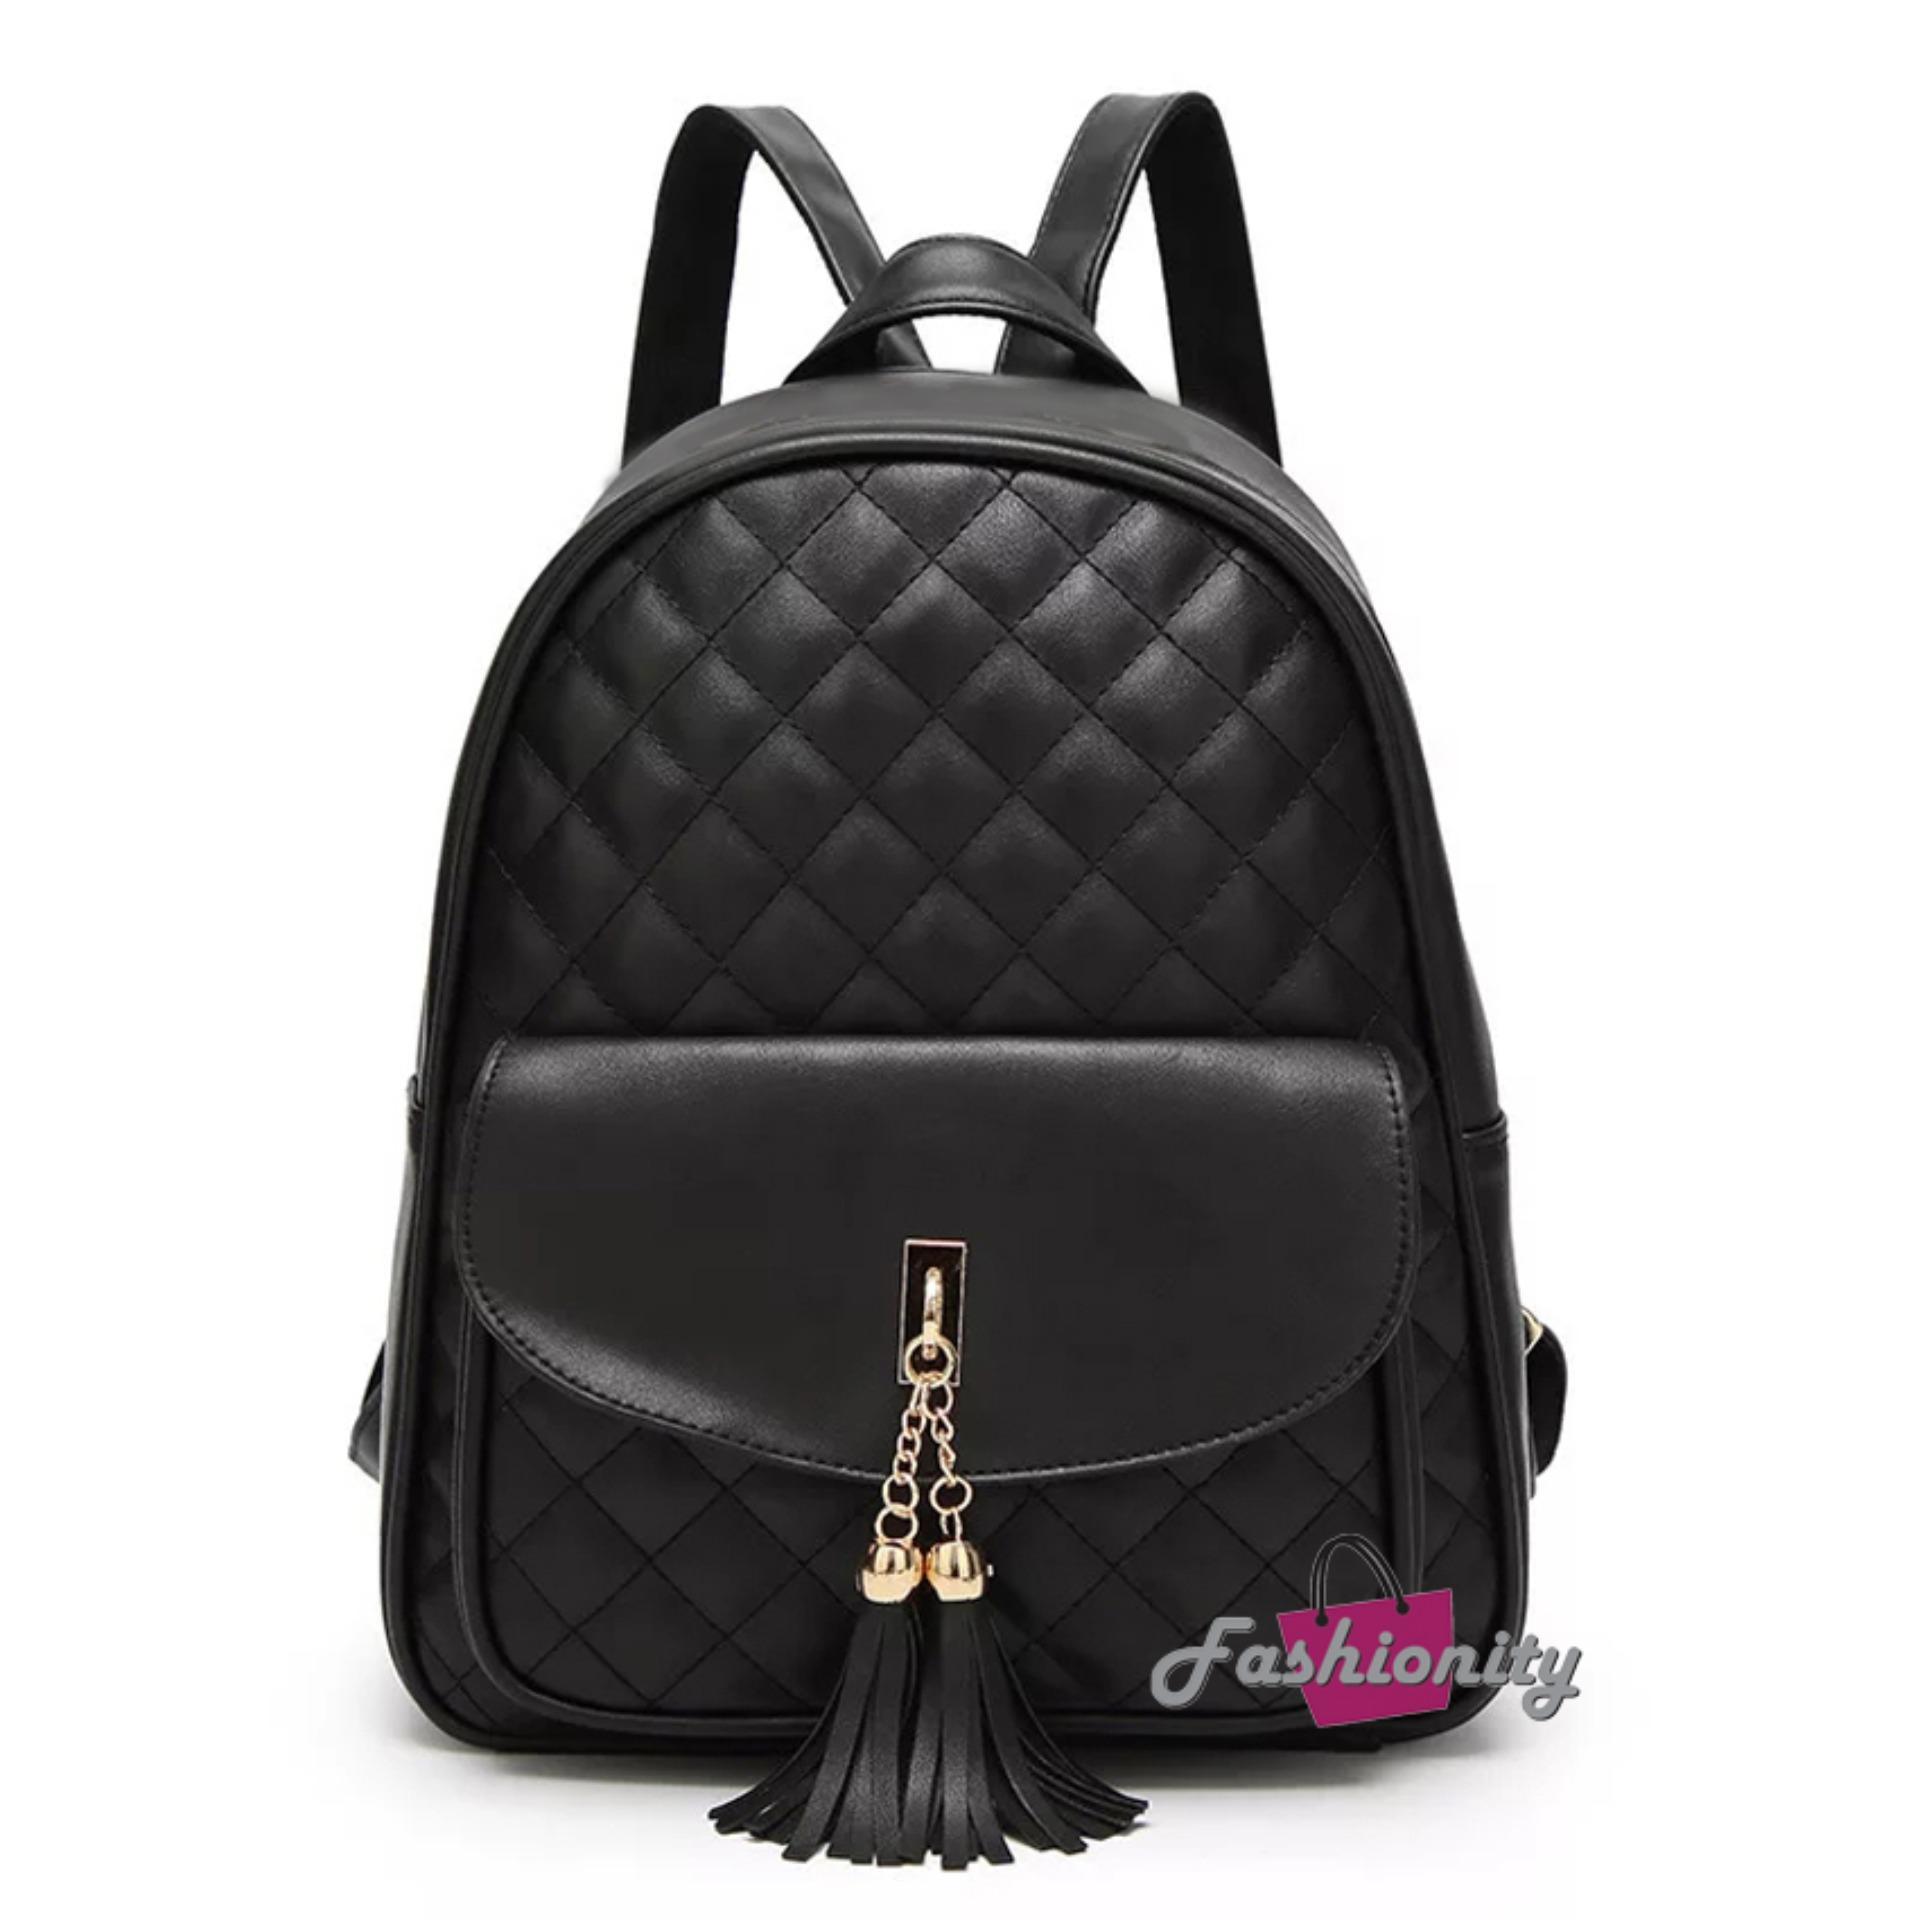 Fashionity Fiona Tassel Backpack - Tas Ransel - Tas Wanita - Korea style - Backpack - Tas Punggung - Tas Murah - Tas Bagus